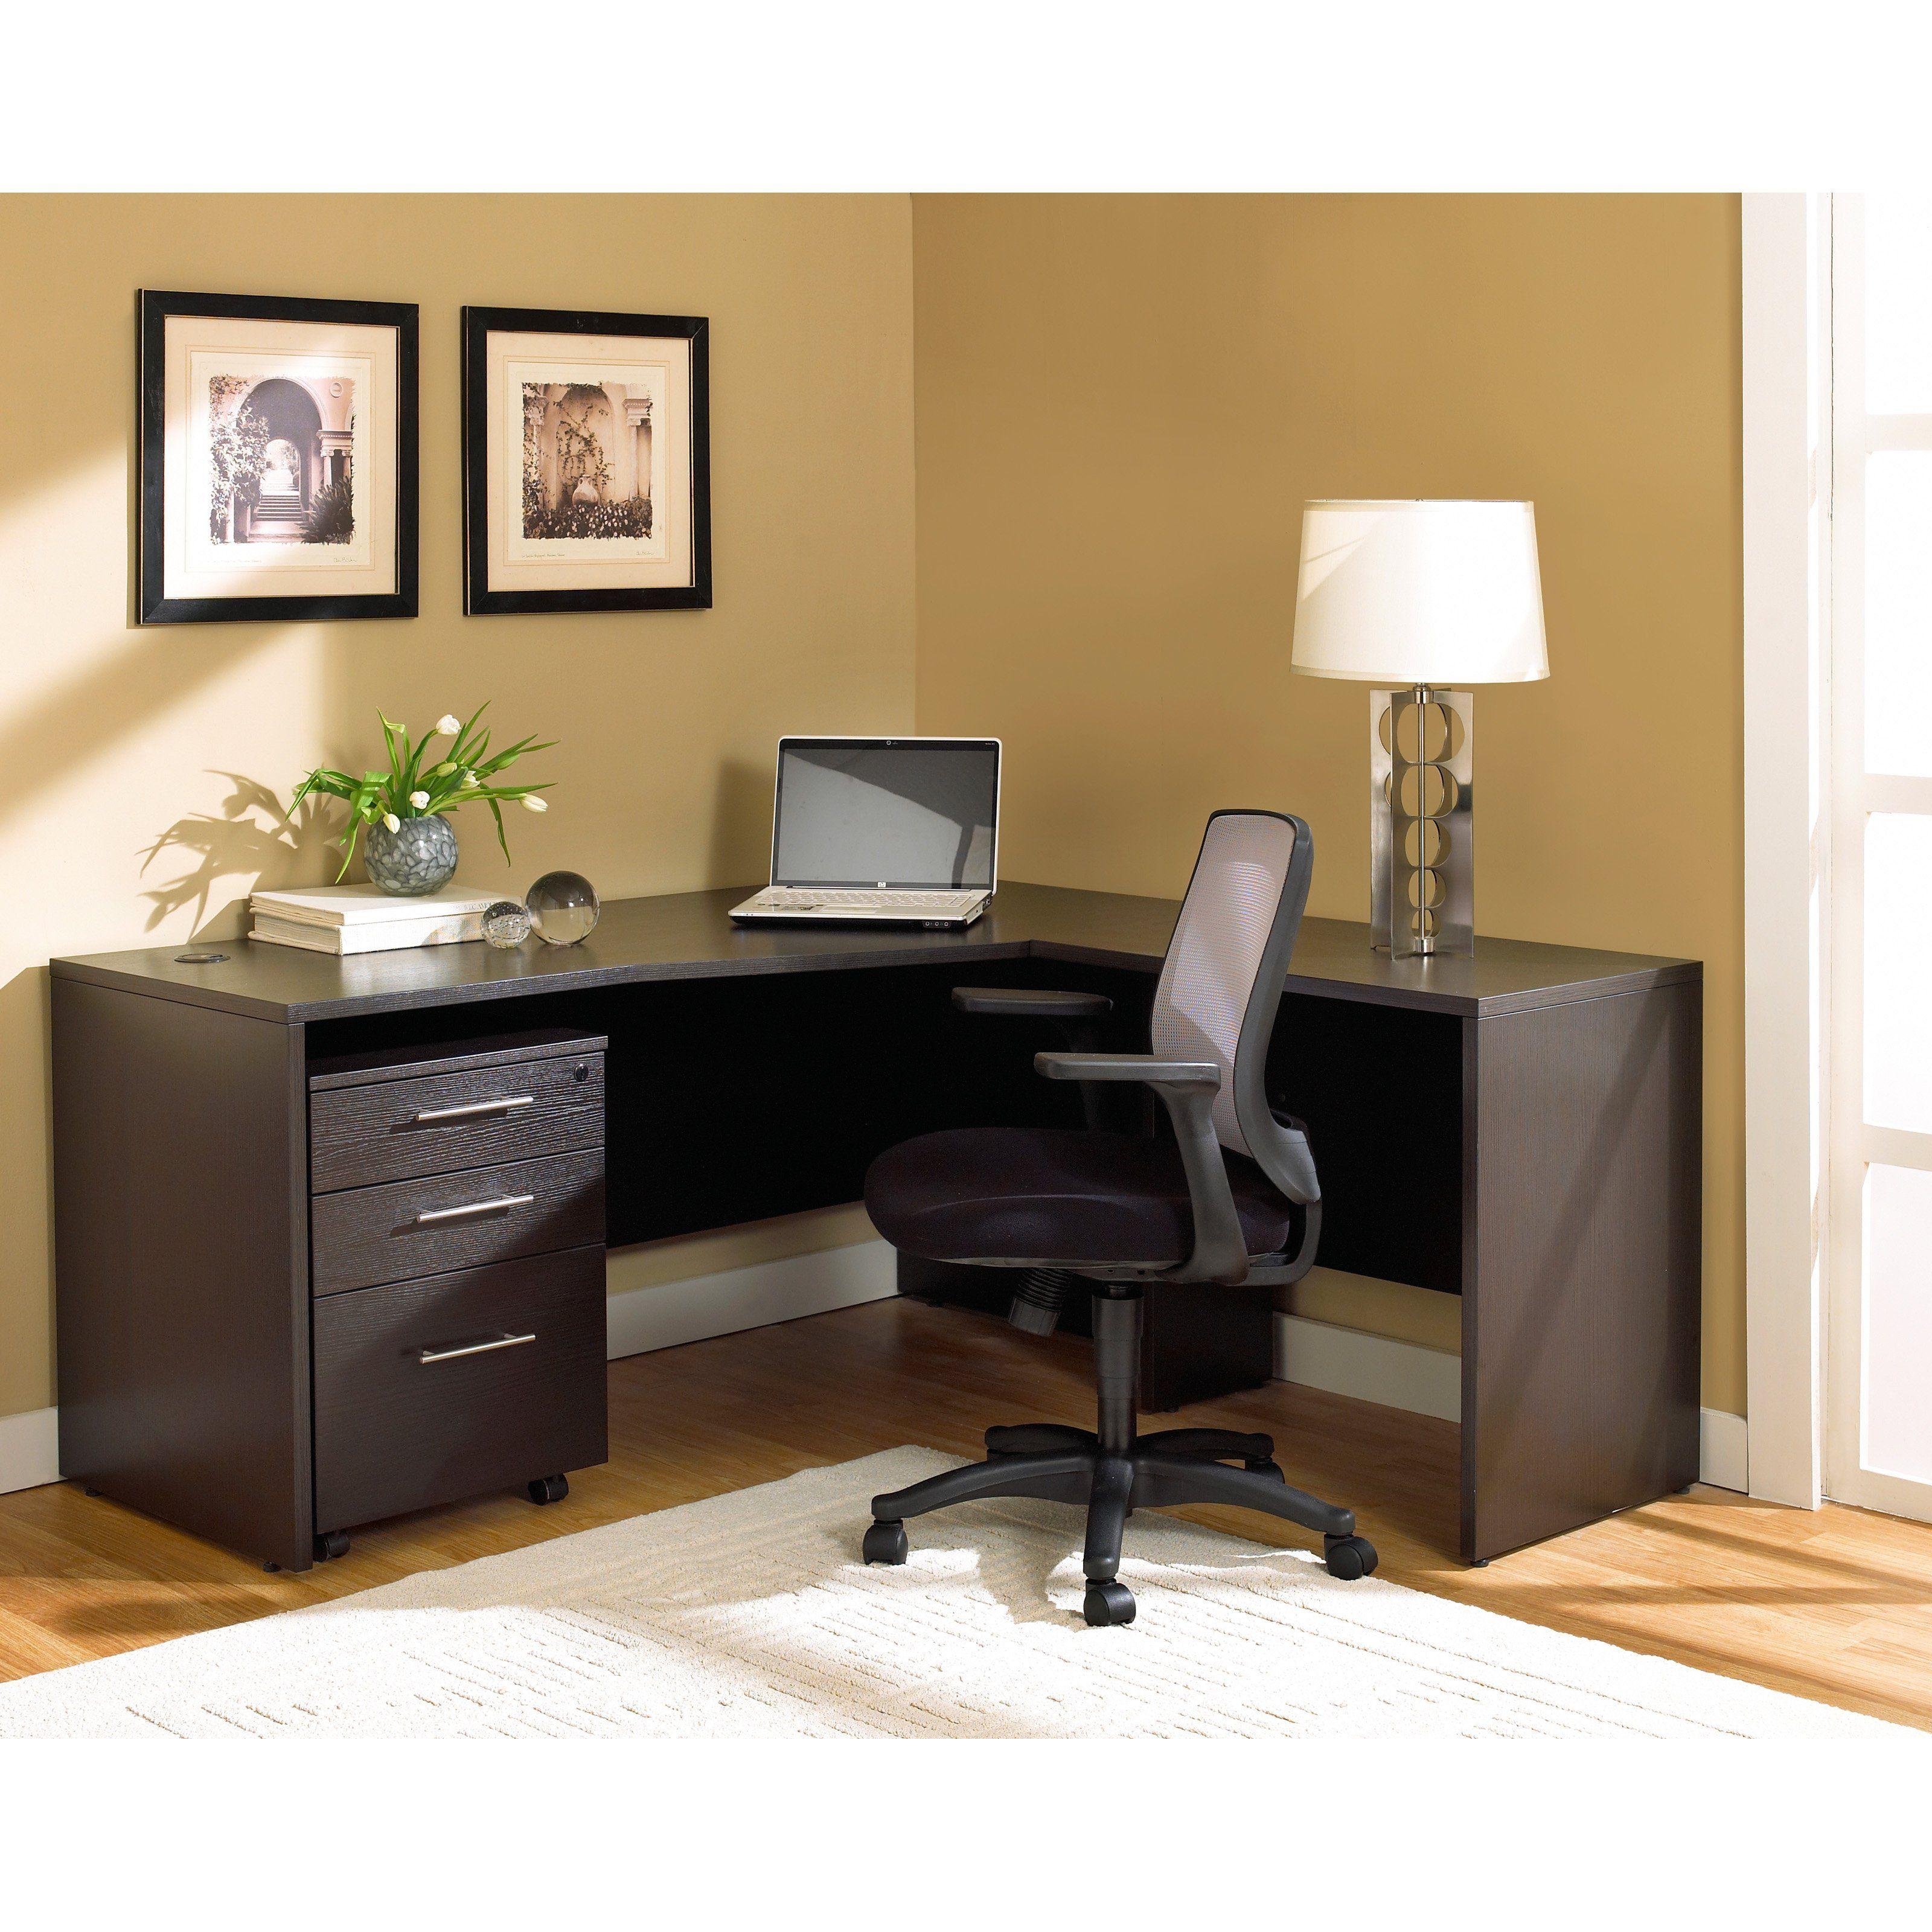 Computer Home Office Desk Office Furniture Black Corner Office